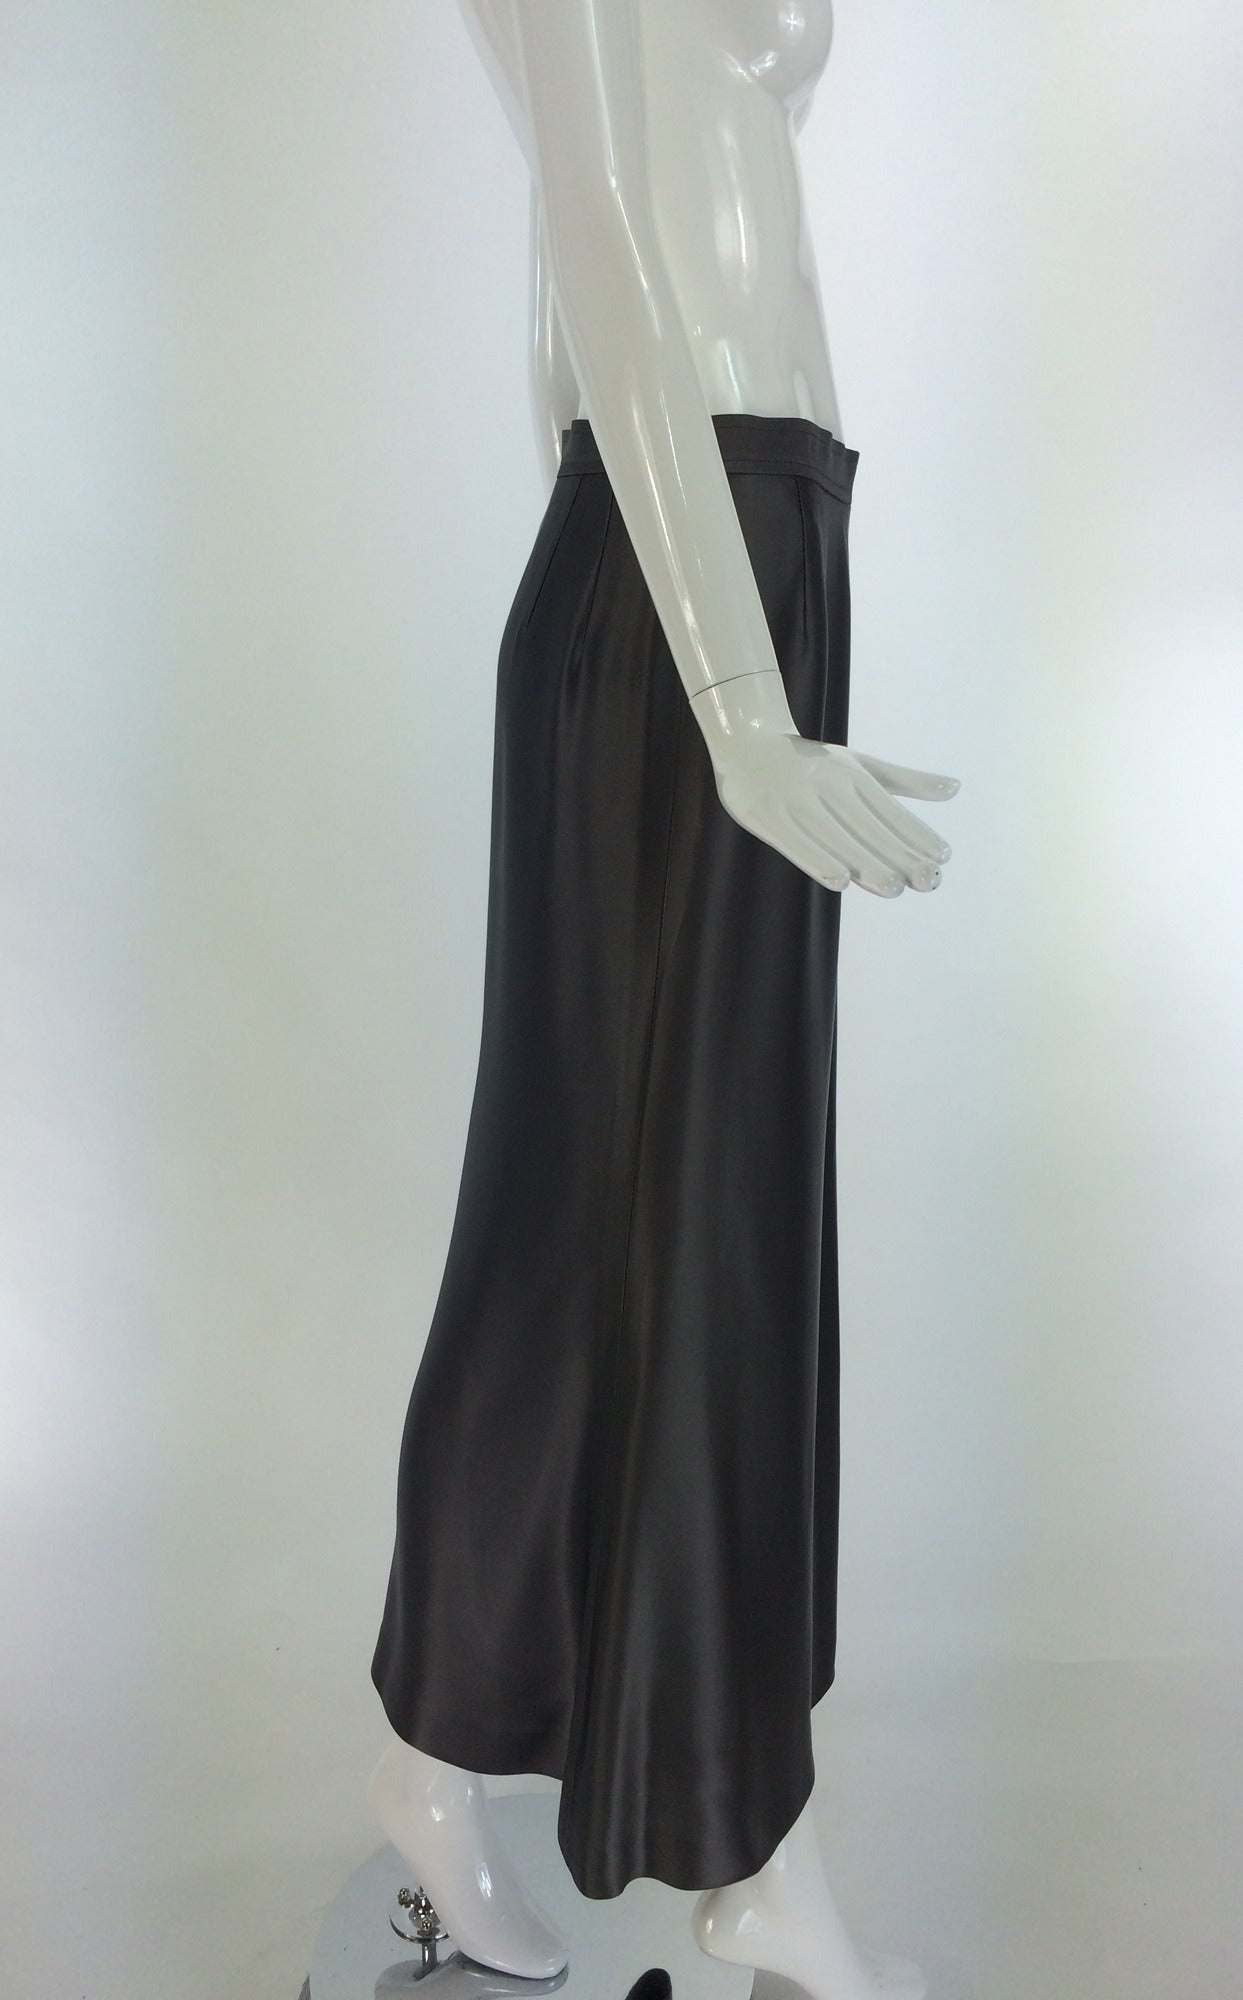 Yves St Laurent Rive Gauche silver grey satin evening skirt 1990s 4